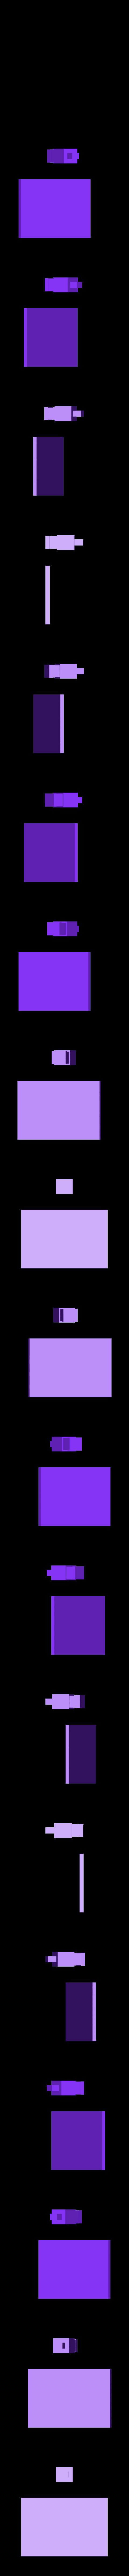 PiggyBankParts.stl Download free STL file 8-bit Piggy Bank • 3D printer object, DelhiCucumber